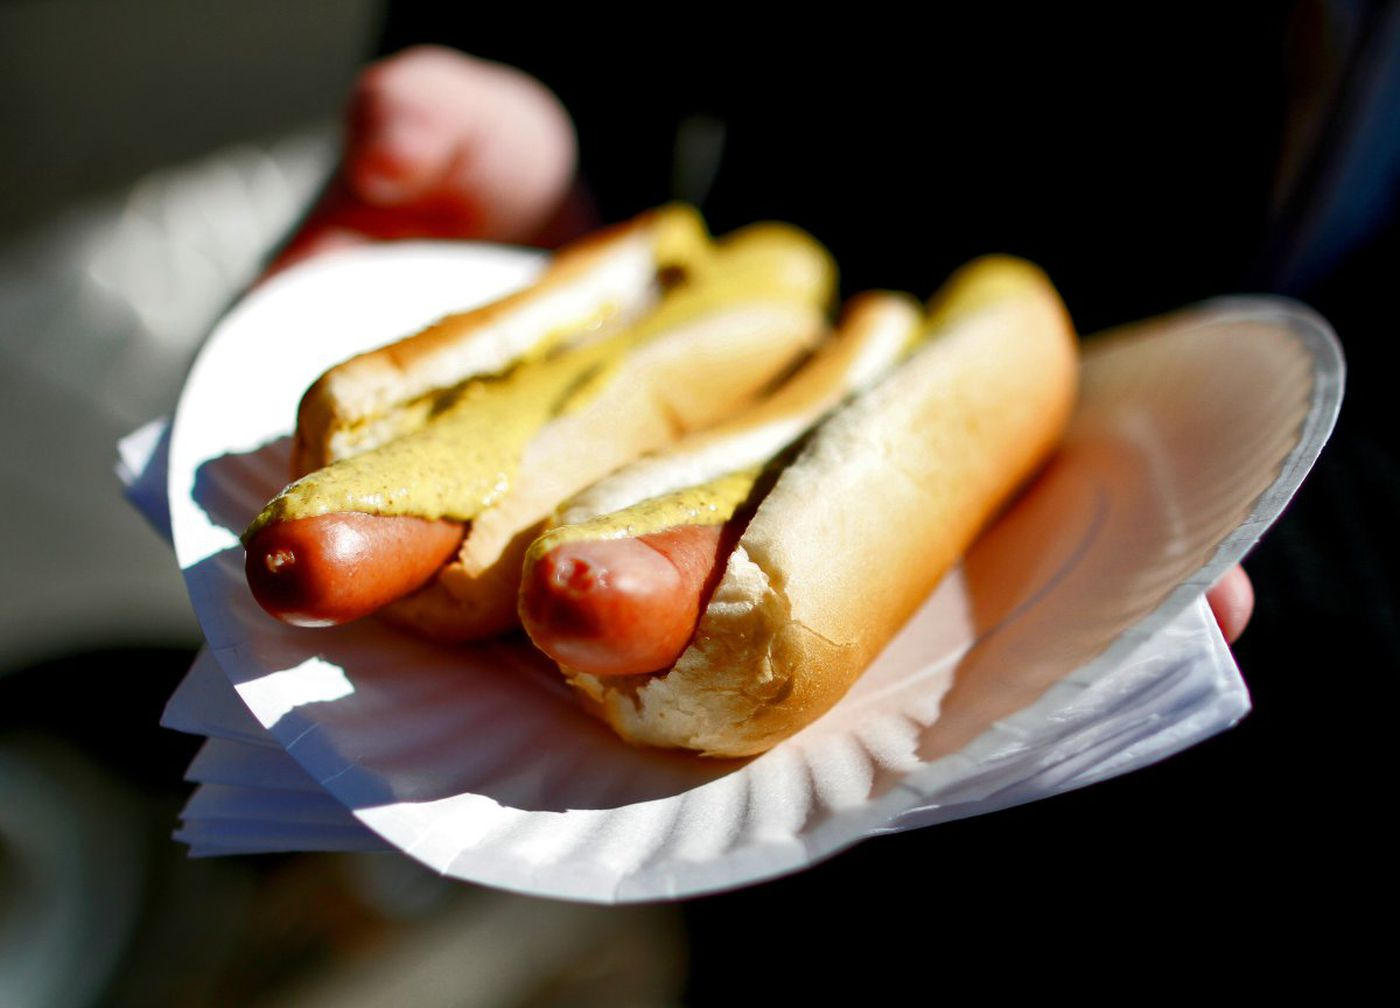 Fullsize Of Nathans Hotdog Recall